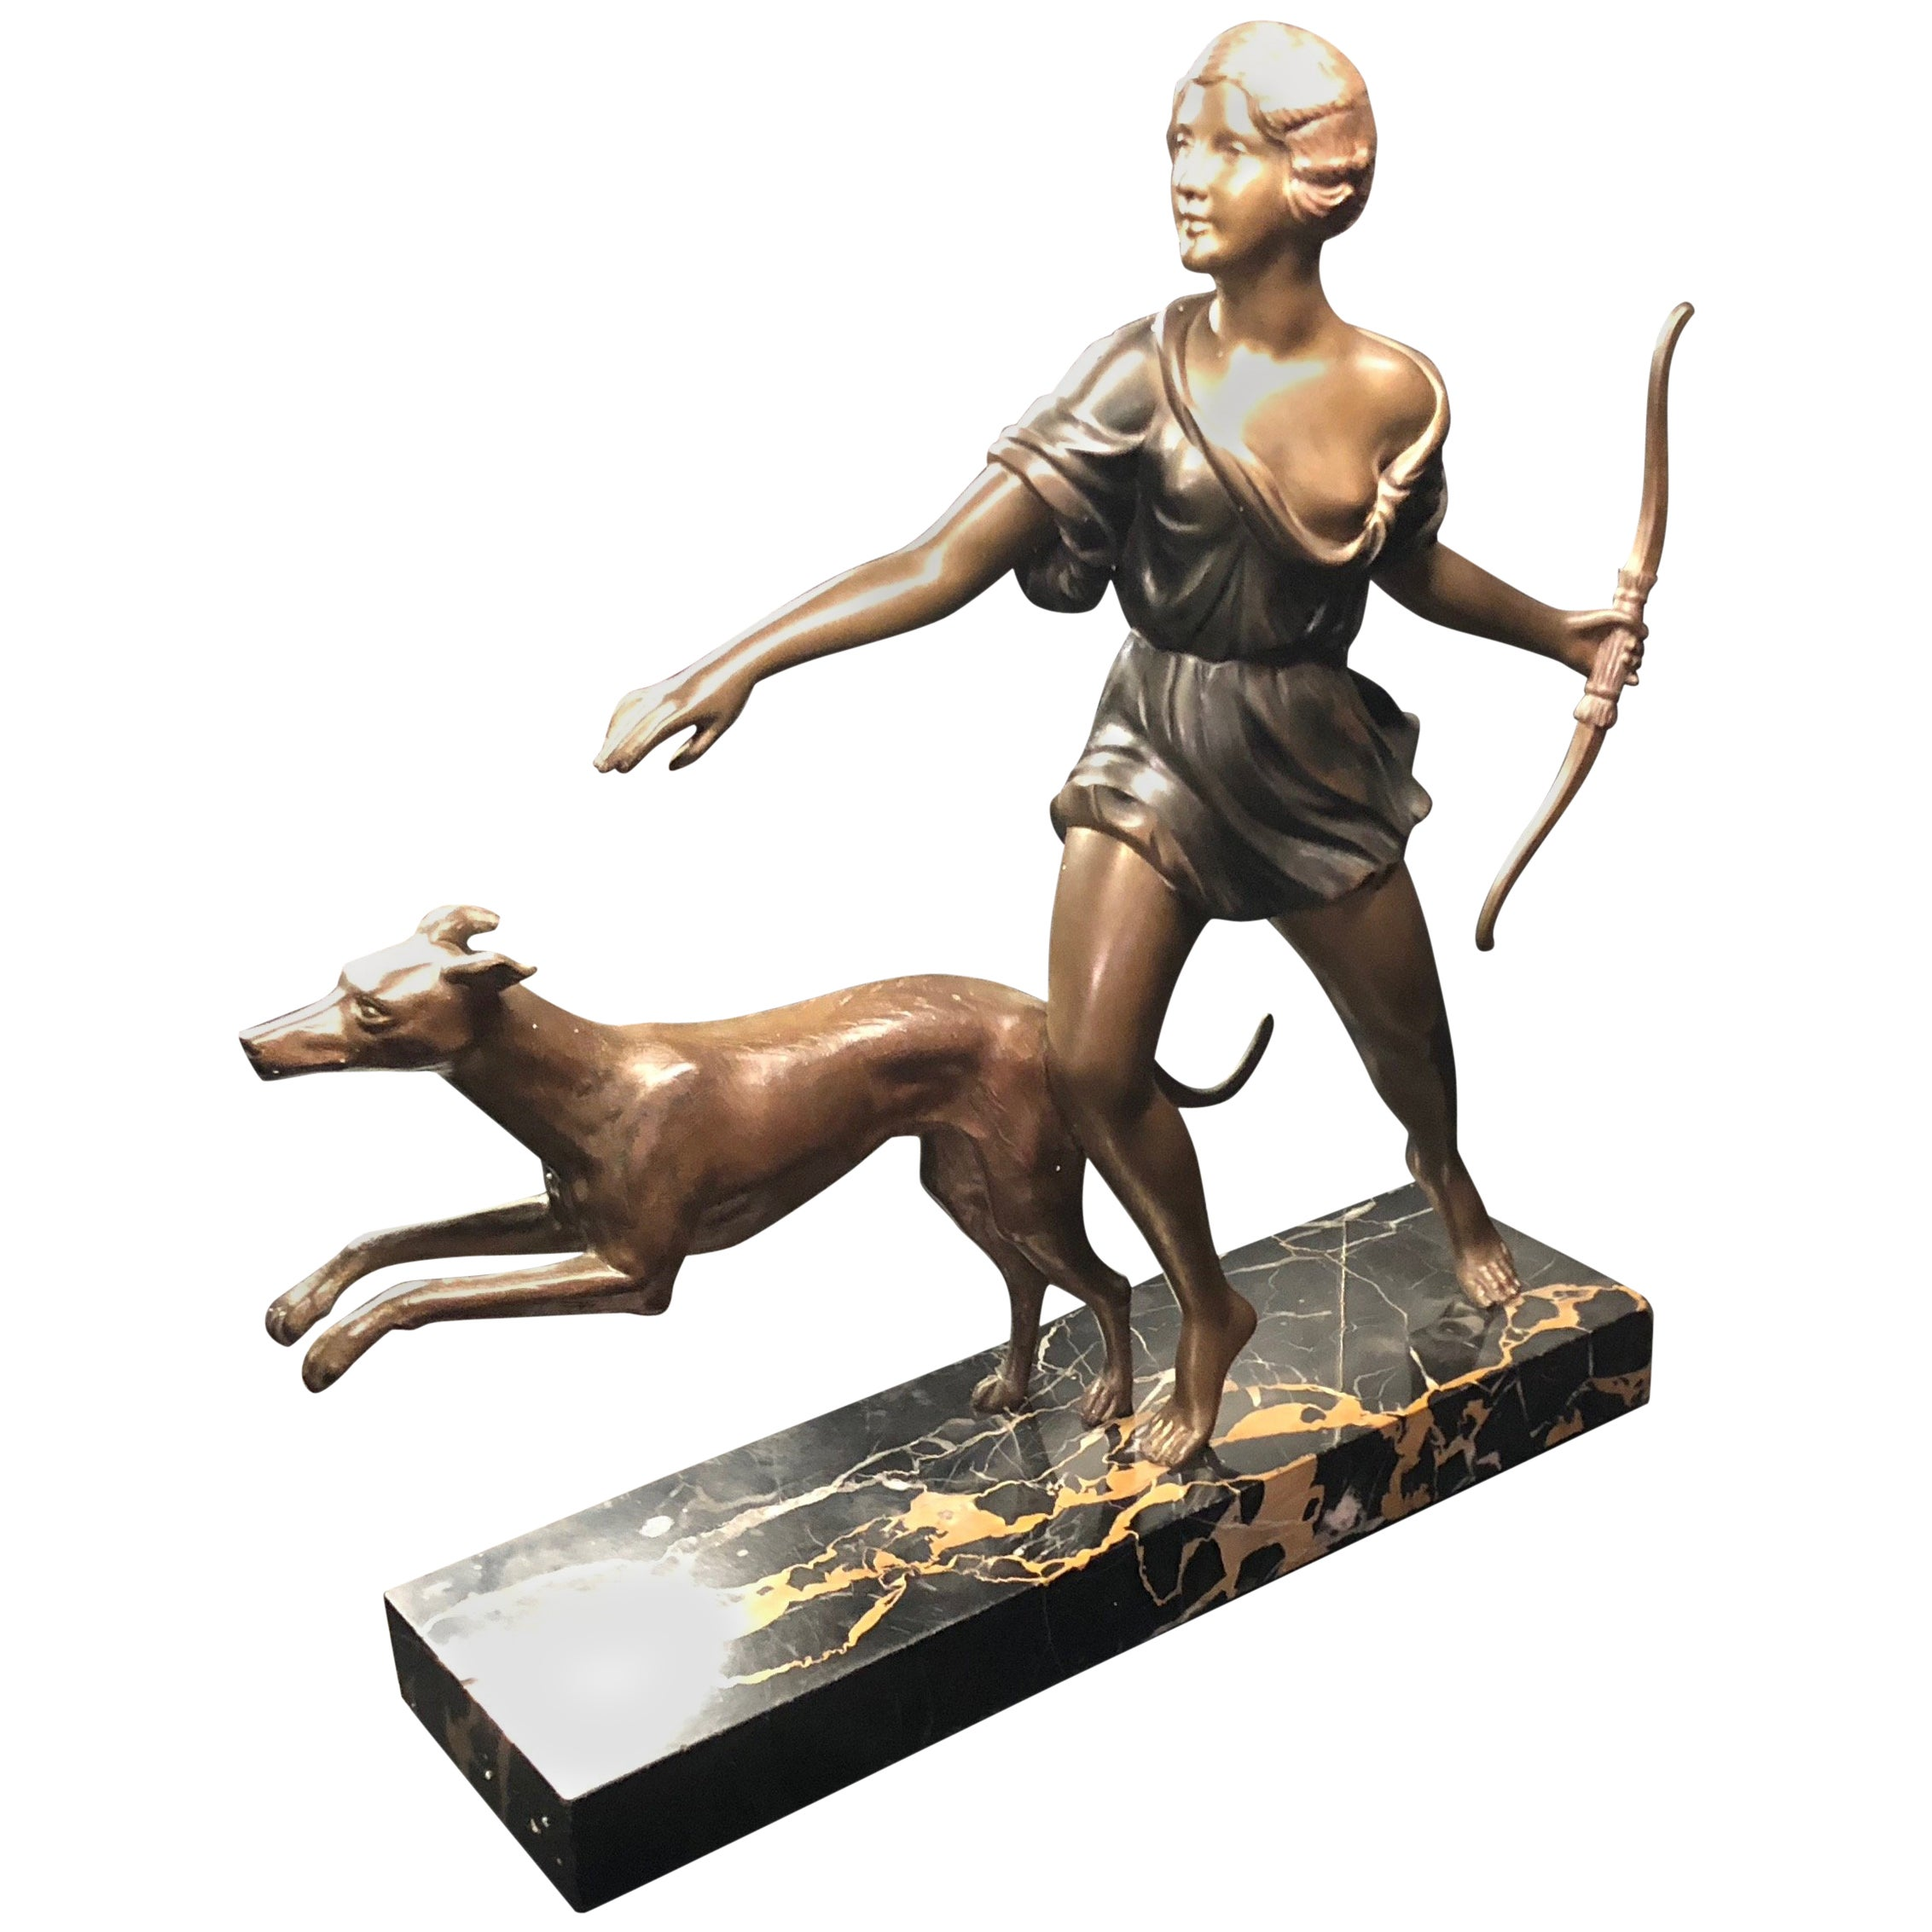 French Art Deco Diana Greyhound Bronze by Ignacio Gallo Sculpture